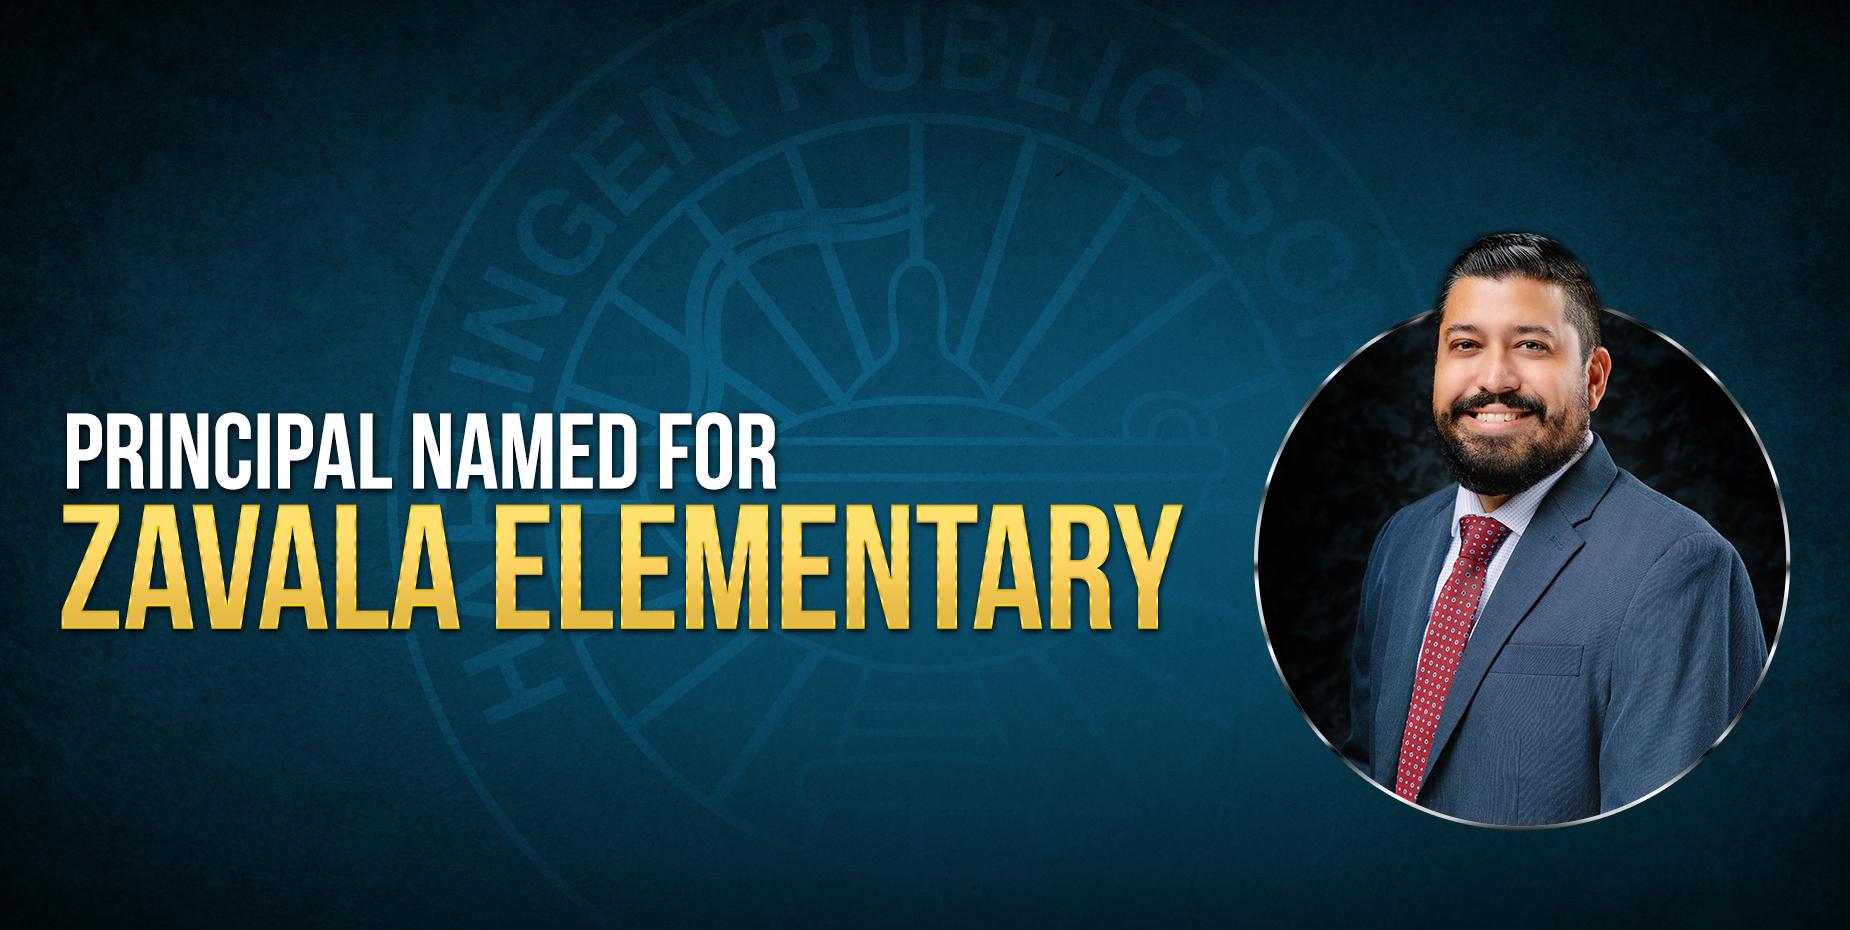 Principal named for Zavala Elementary